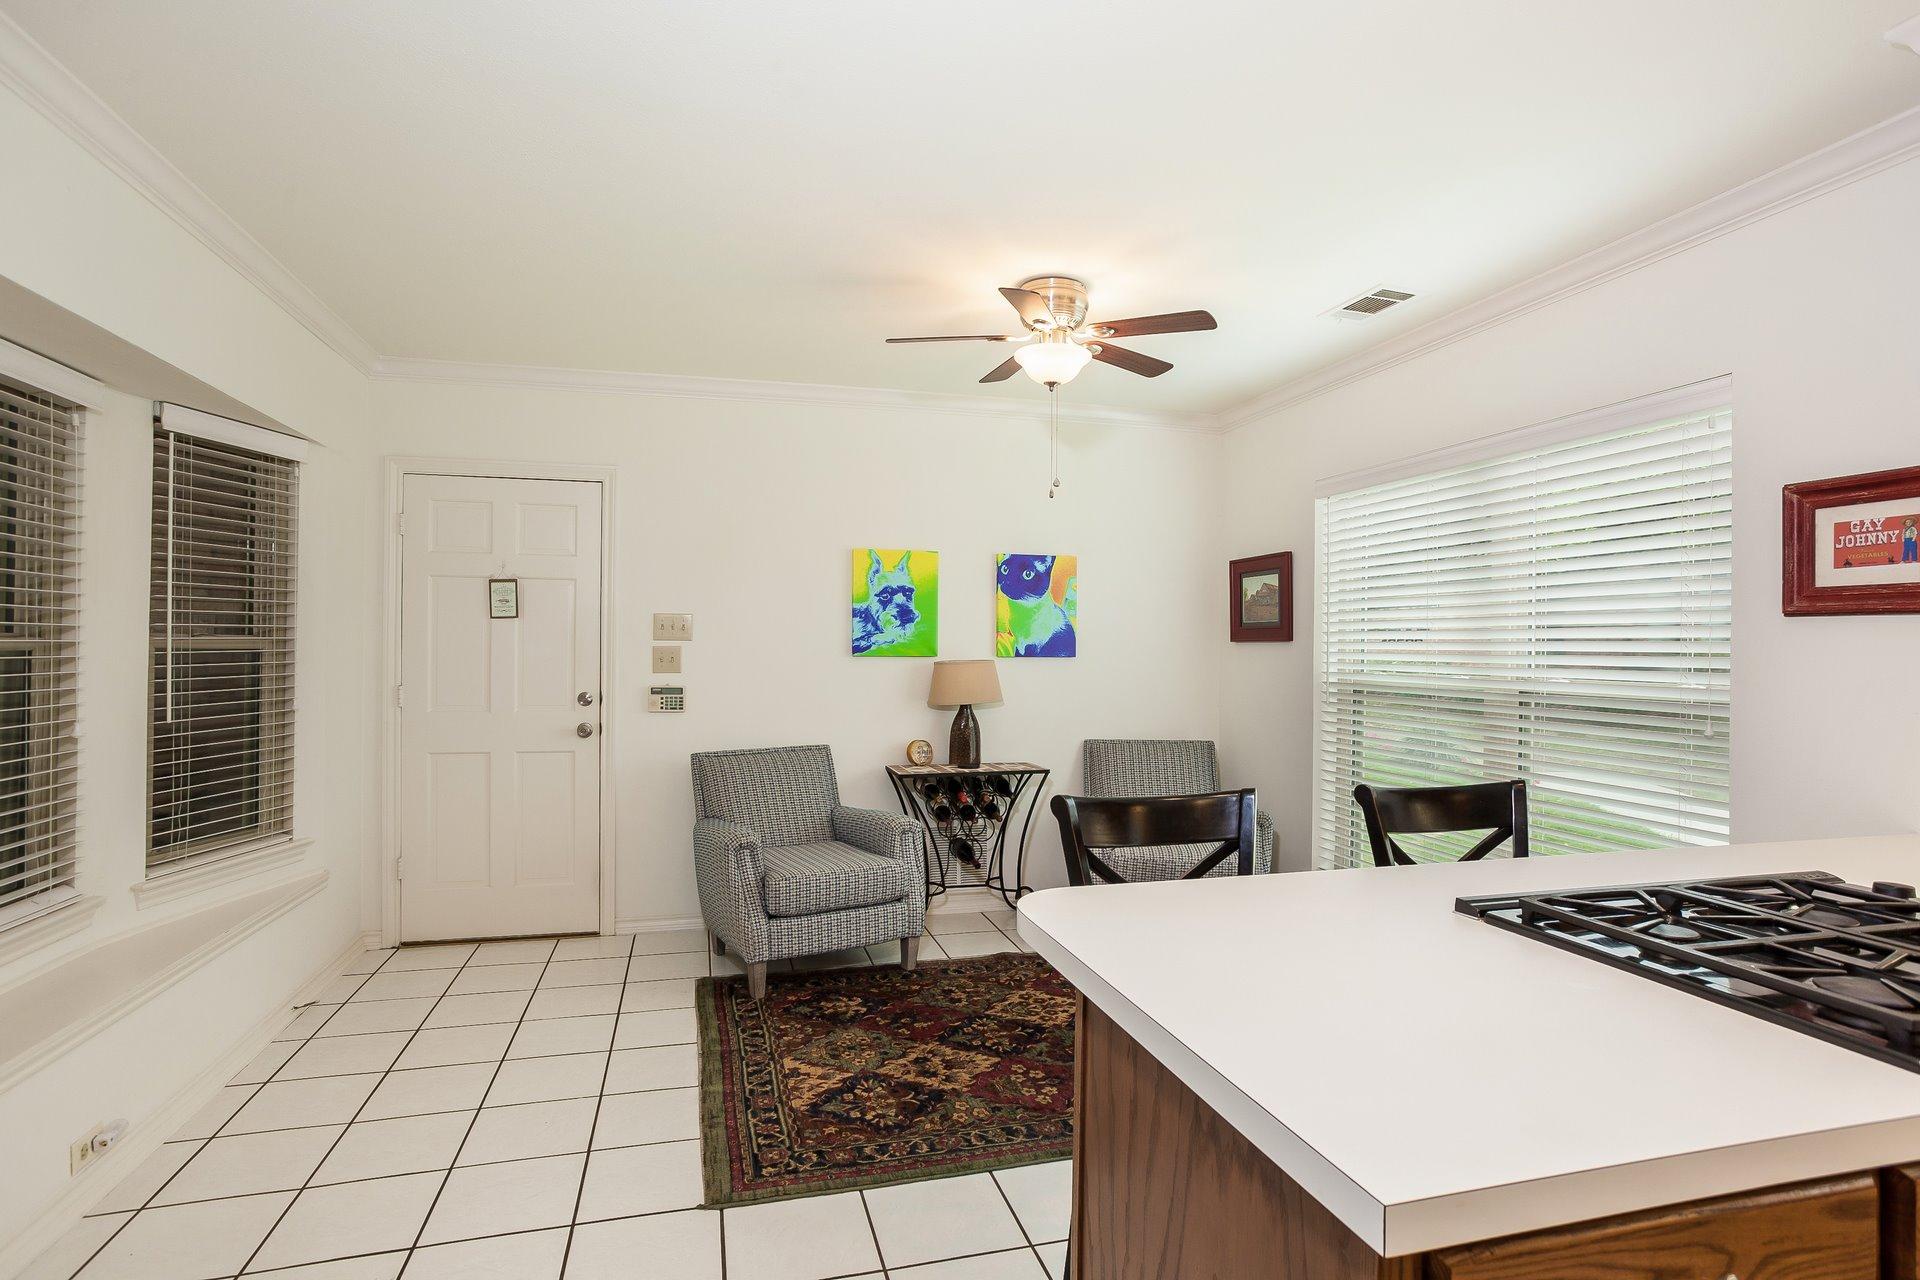 7 - 12598 Montego Plaza, Dallas TX 75230 Robert Jory Group.jpg